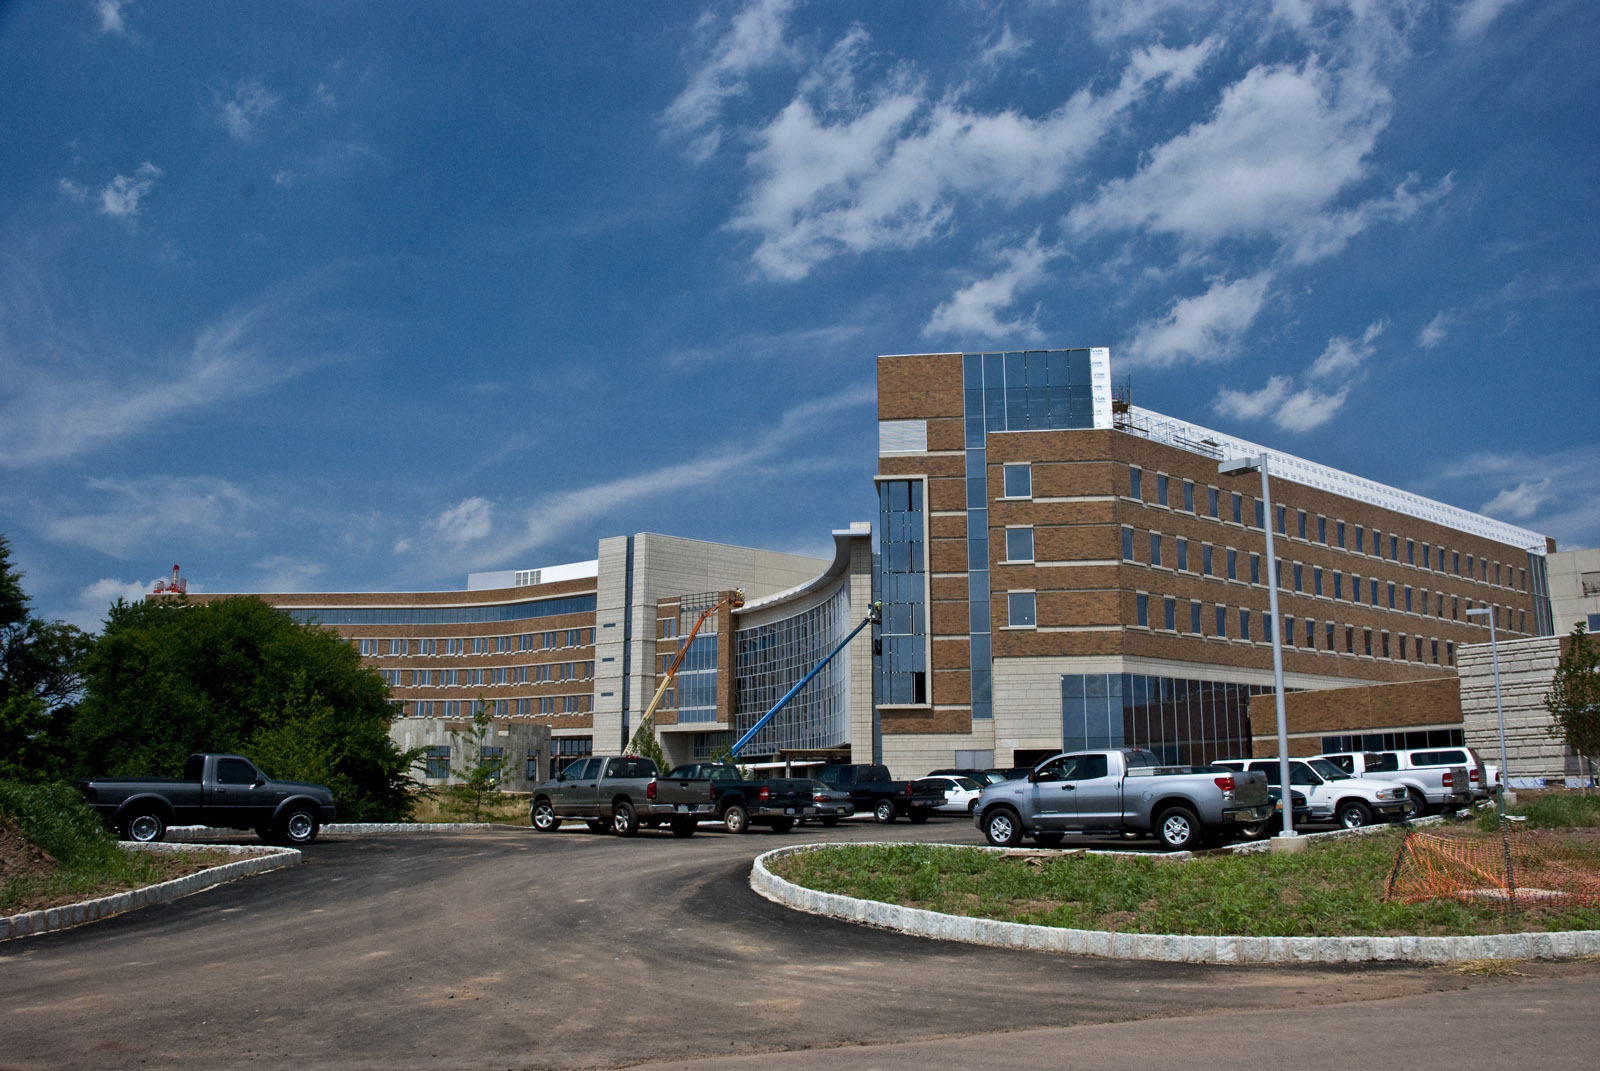 scaffold-rent-scaffolding-superior-scaffold-system-scaffold-atrium-hospital-nj-new-jersey-119